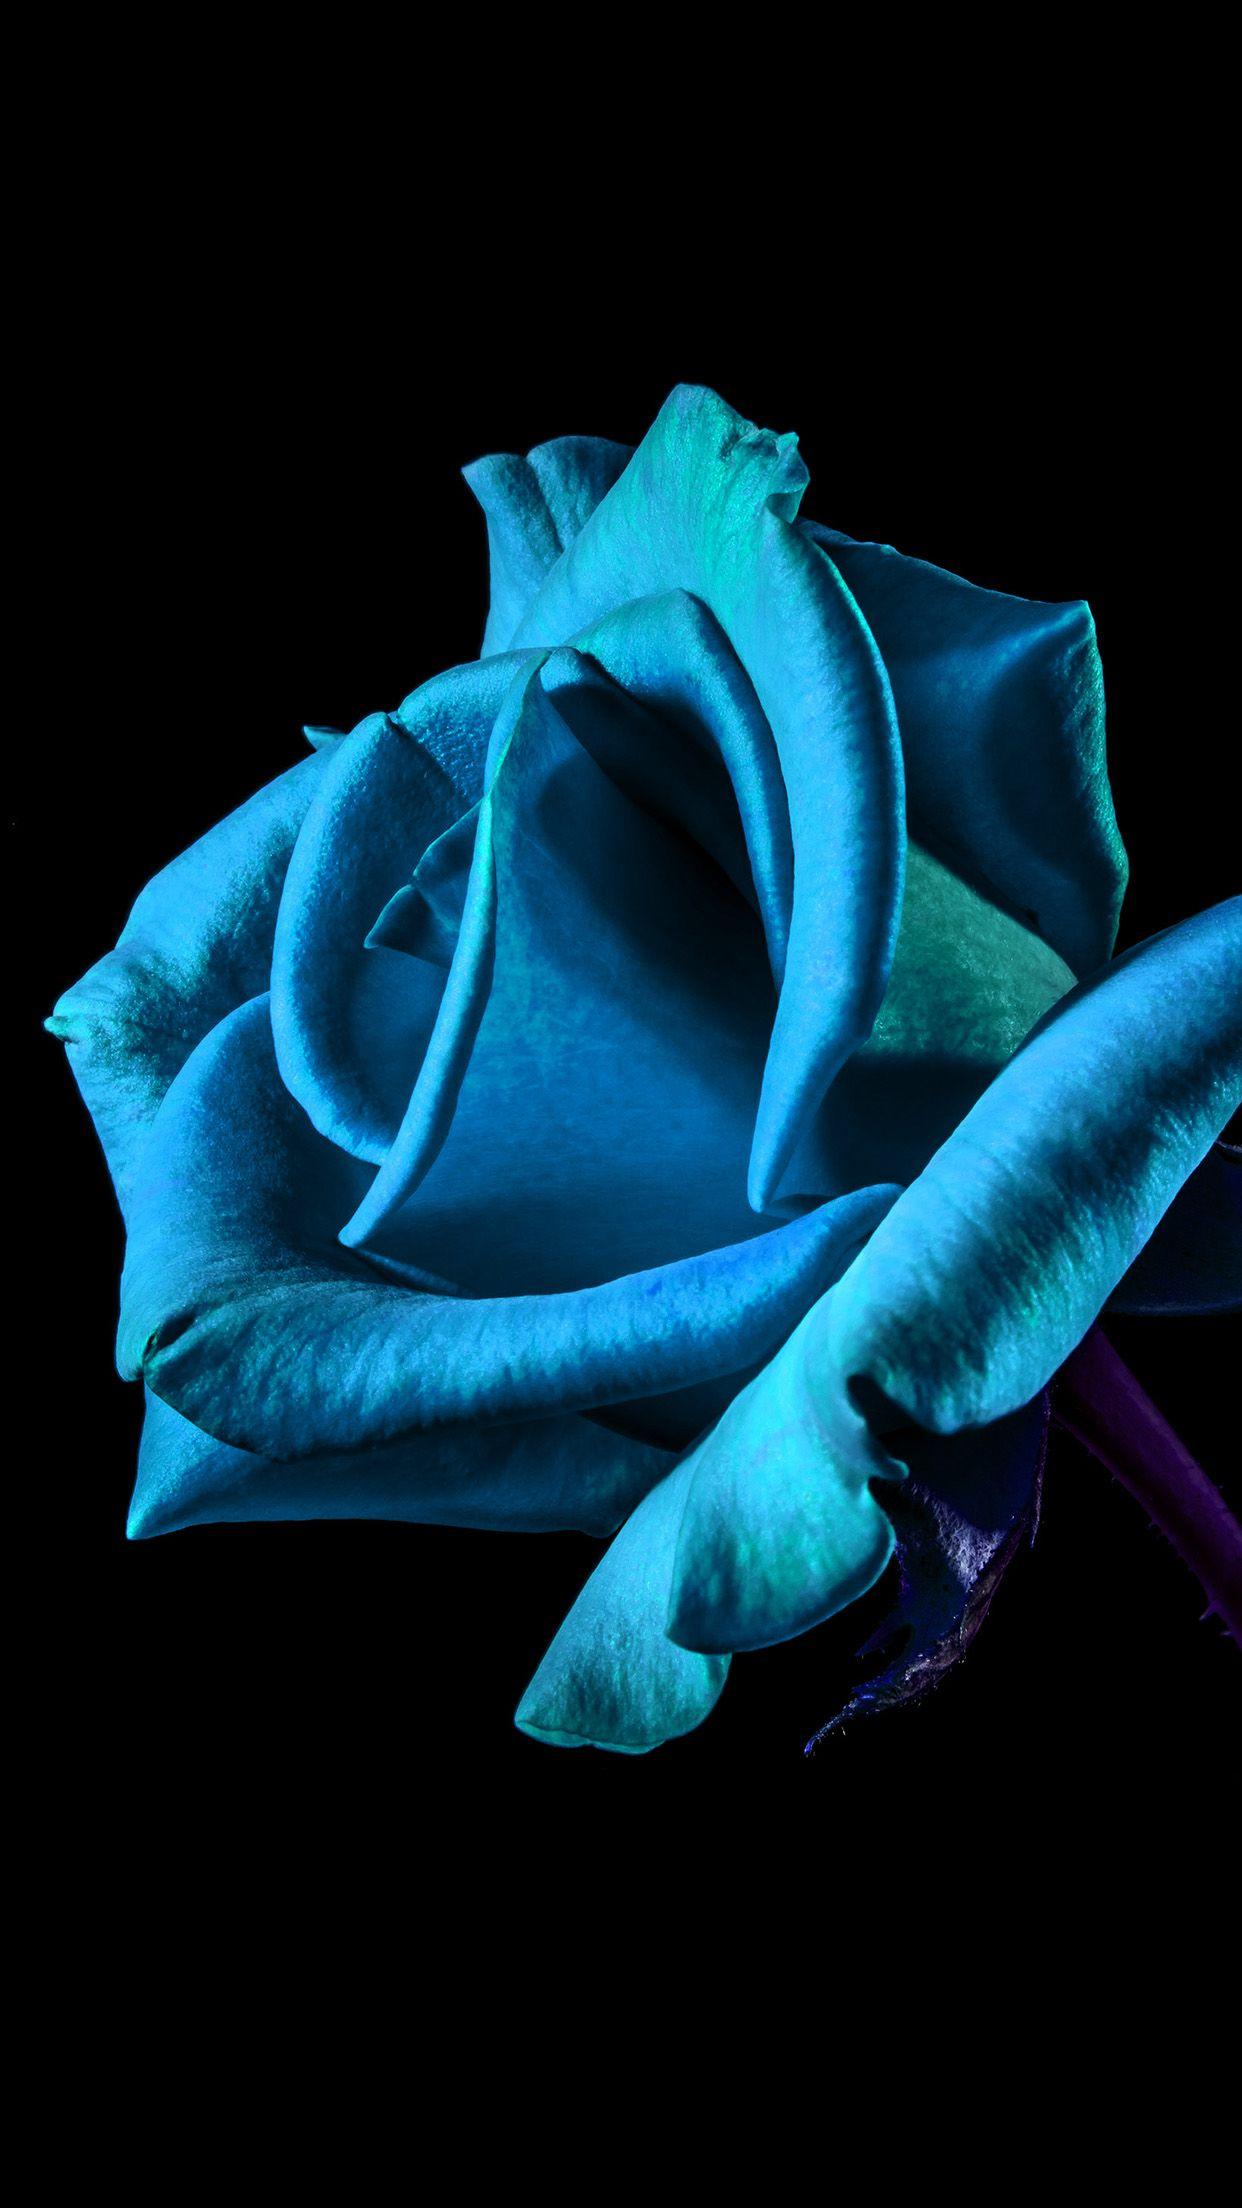 Flower Rose Blue Dark Beautiful Blue Wallpaper Iphone Best Nature Wallpapers Nature Iphone Wallpaper